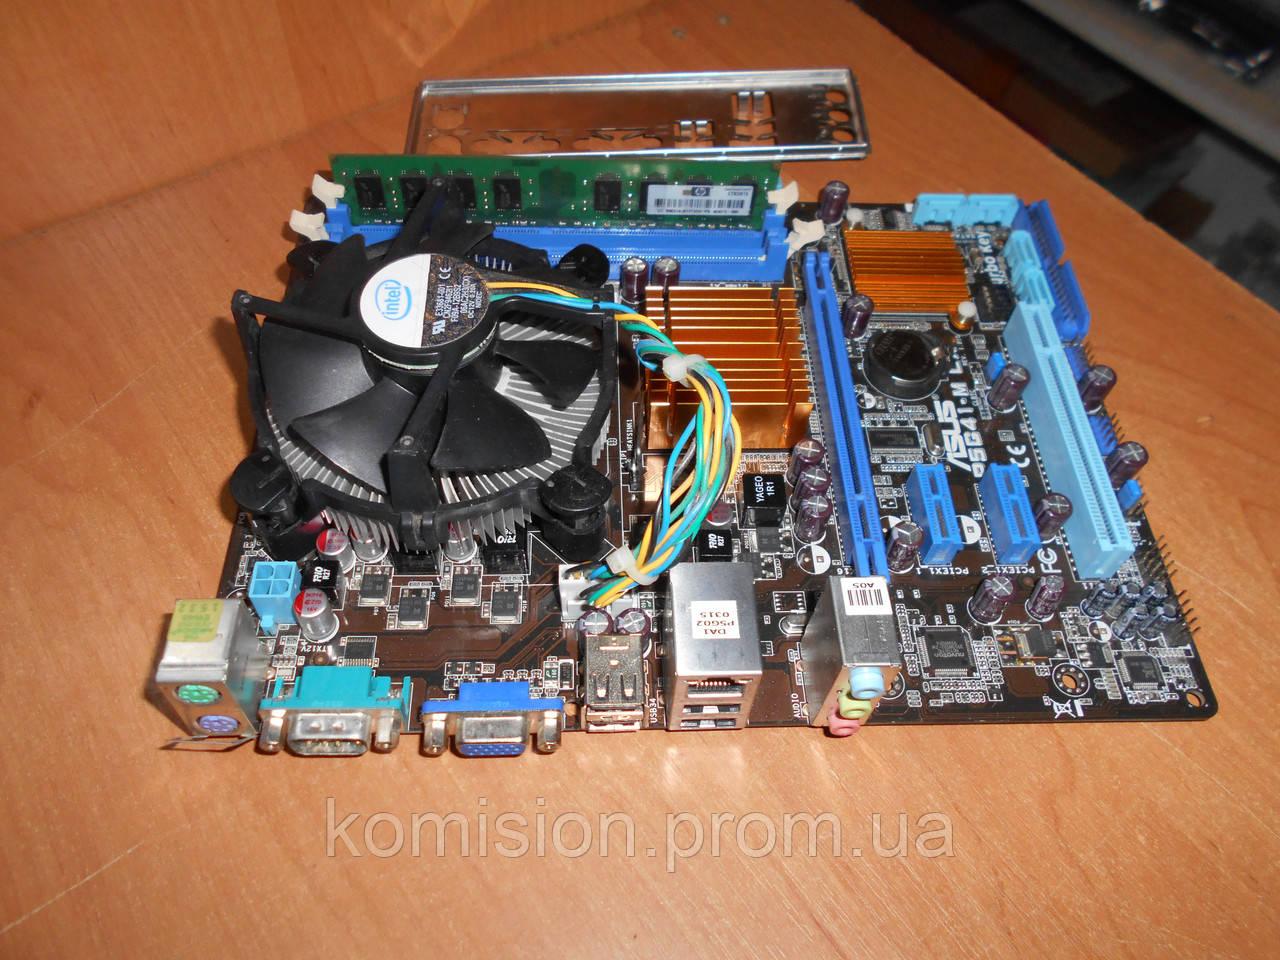 Материнская плата ASUS P5G41-M LX + Q8400 2,66 GHz + 2GB DDR2 комплект